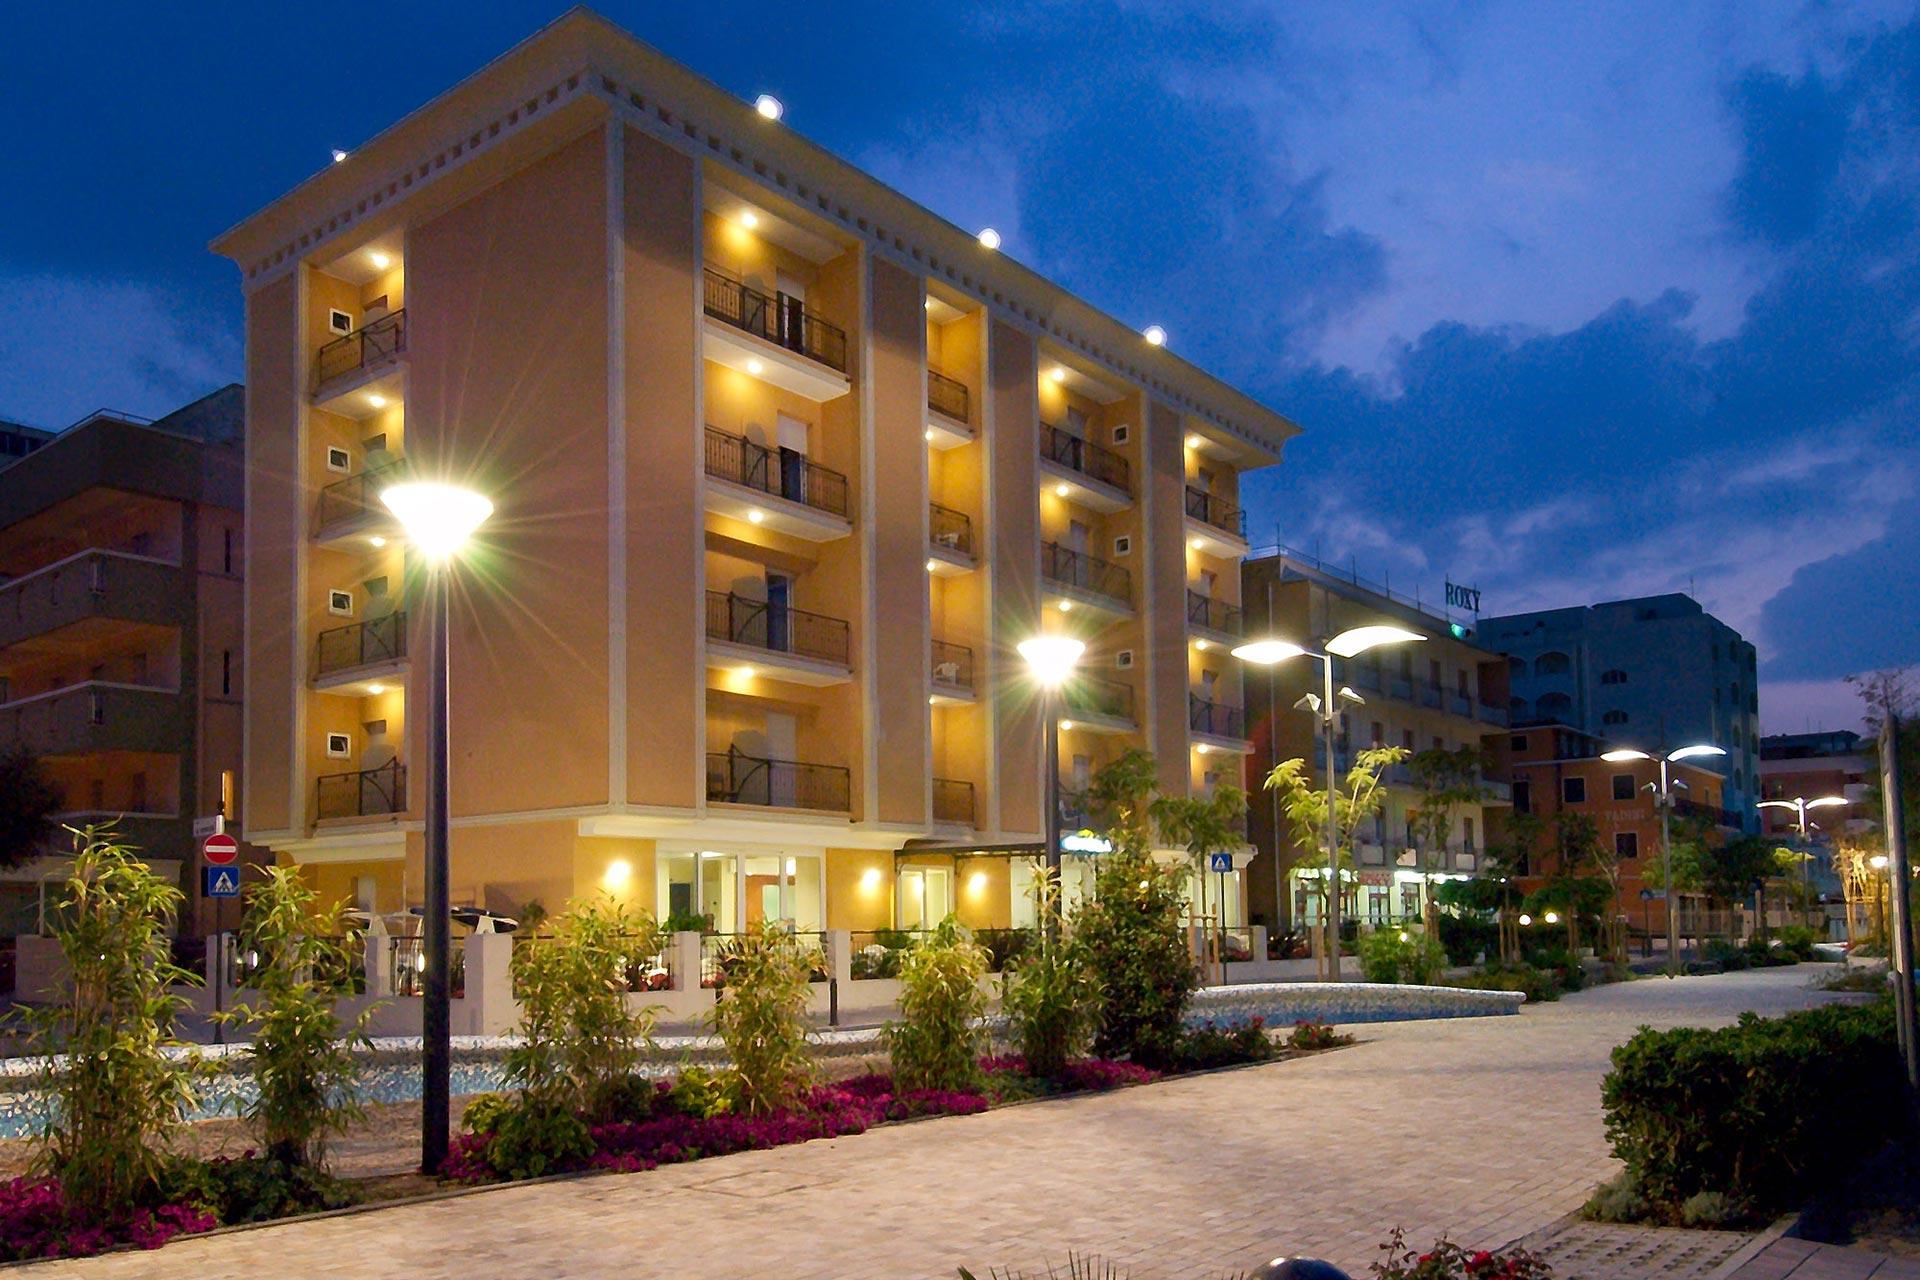 Hotel belvedere 3 stelle in prima fila sul mare a misano for Hotel siracusa 3 stelle